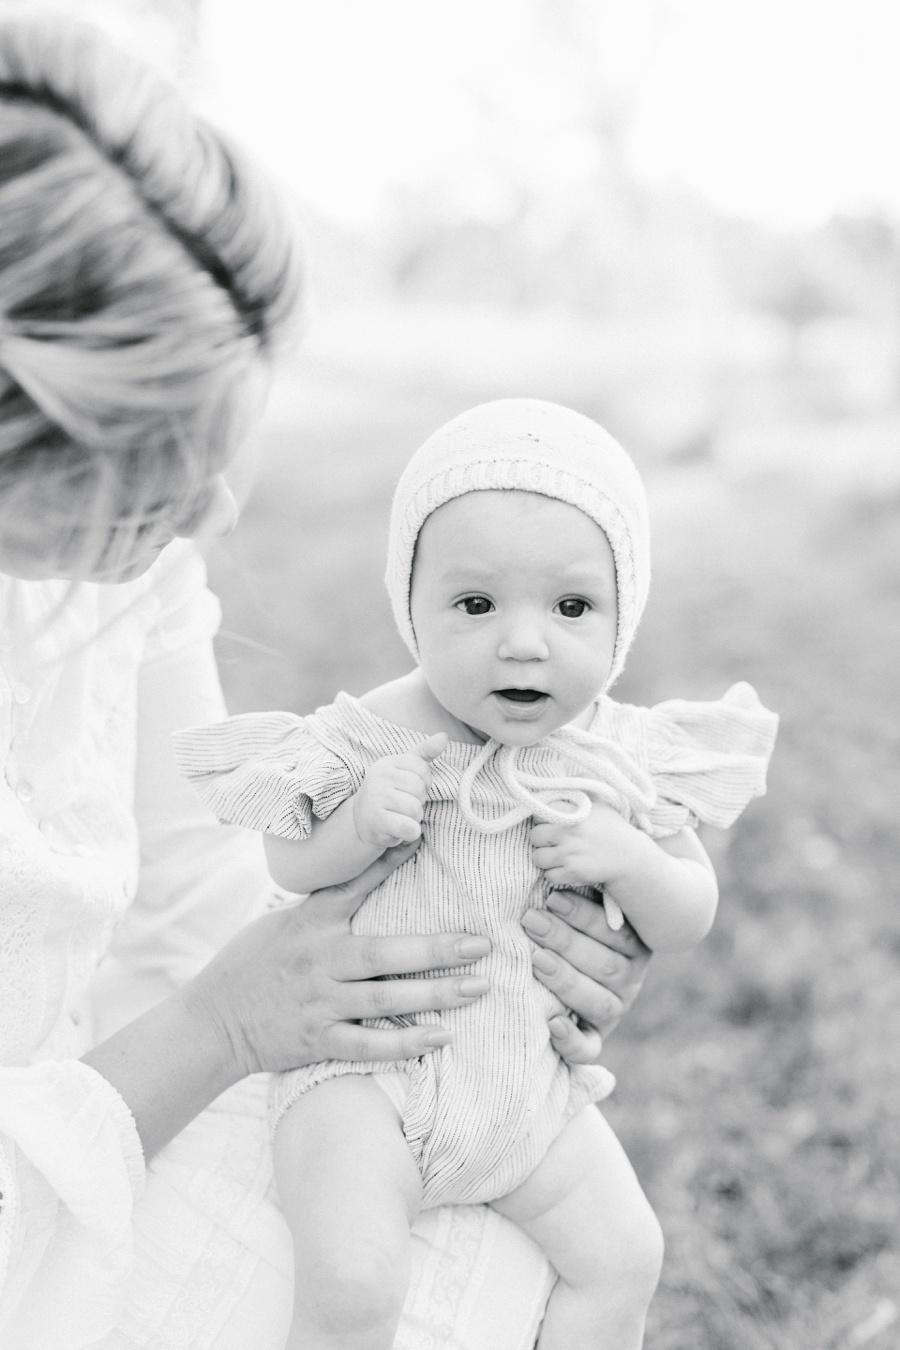 Family-photography-inspiration-131.jpg